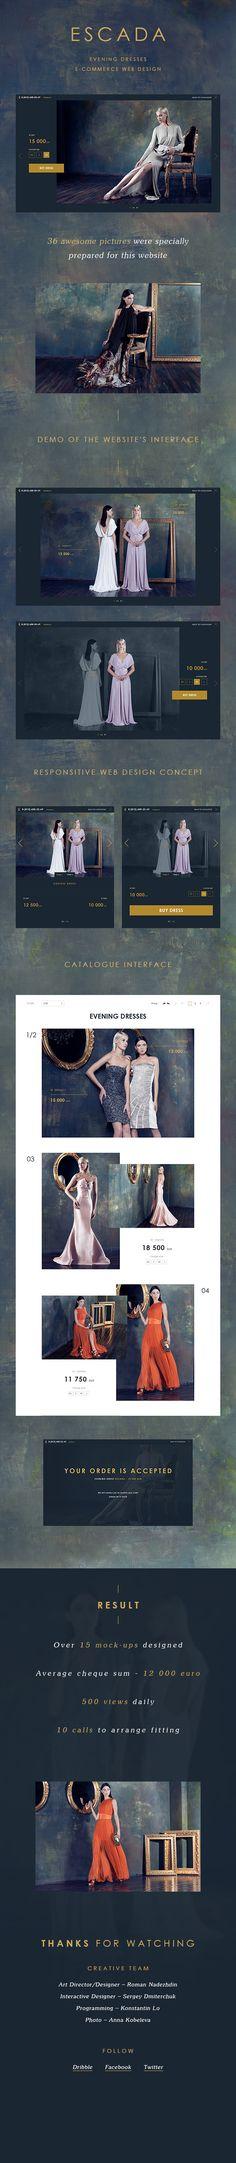 Escada evening dresses - eCommerce website on Behance